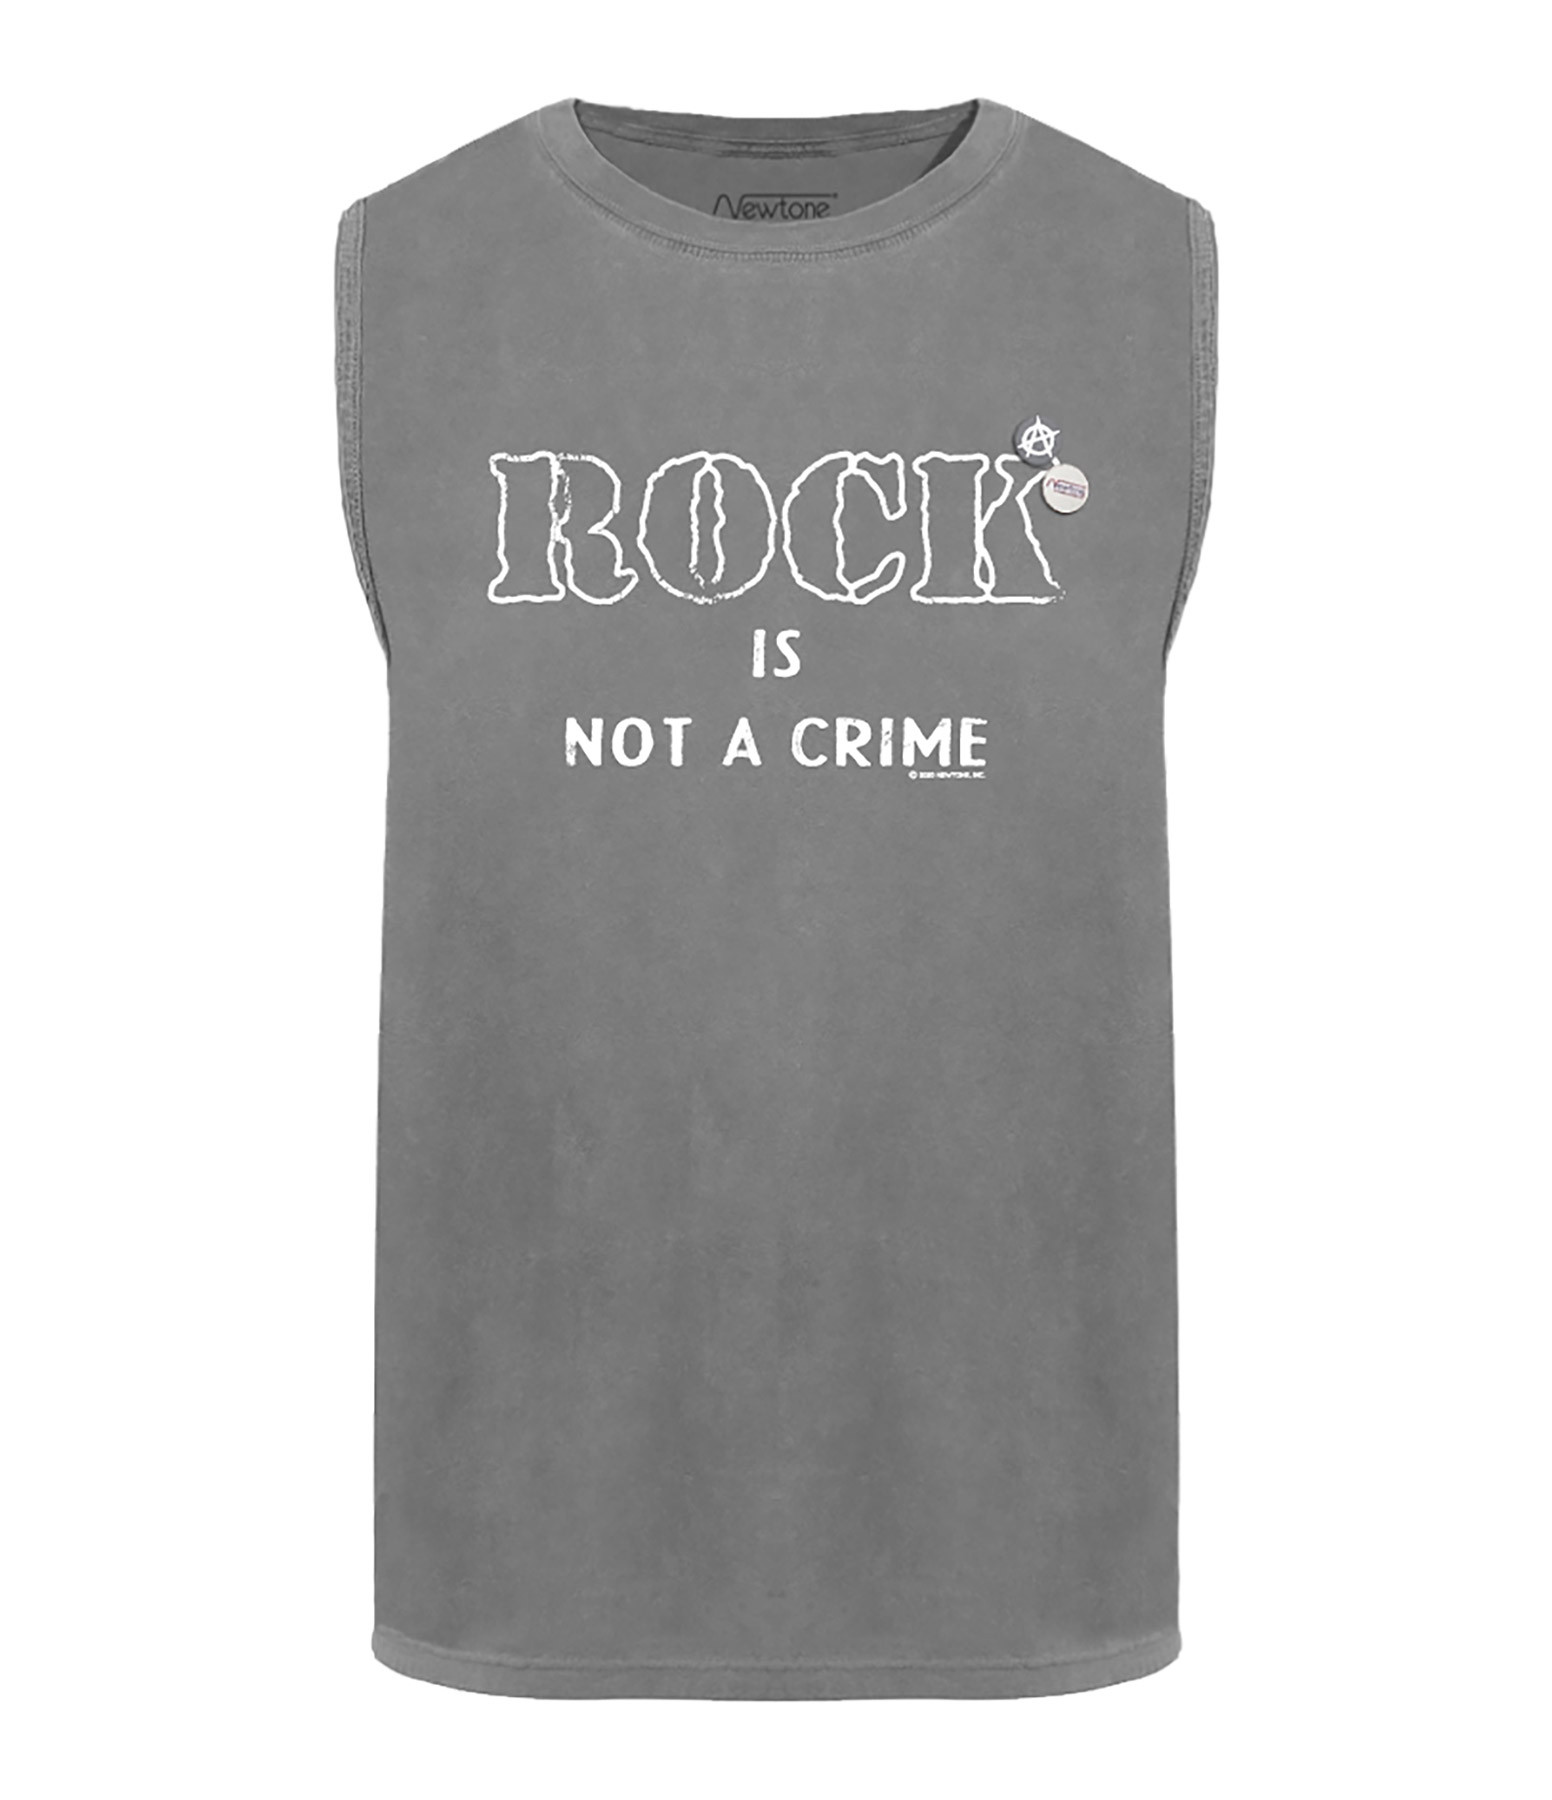 NEWTONE - Tee-shirt Biker Crime Coton Gris